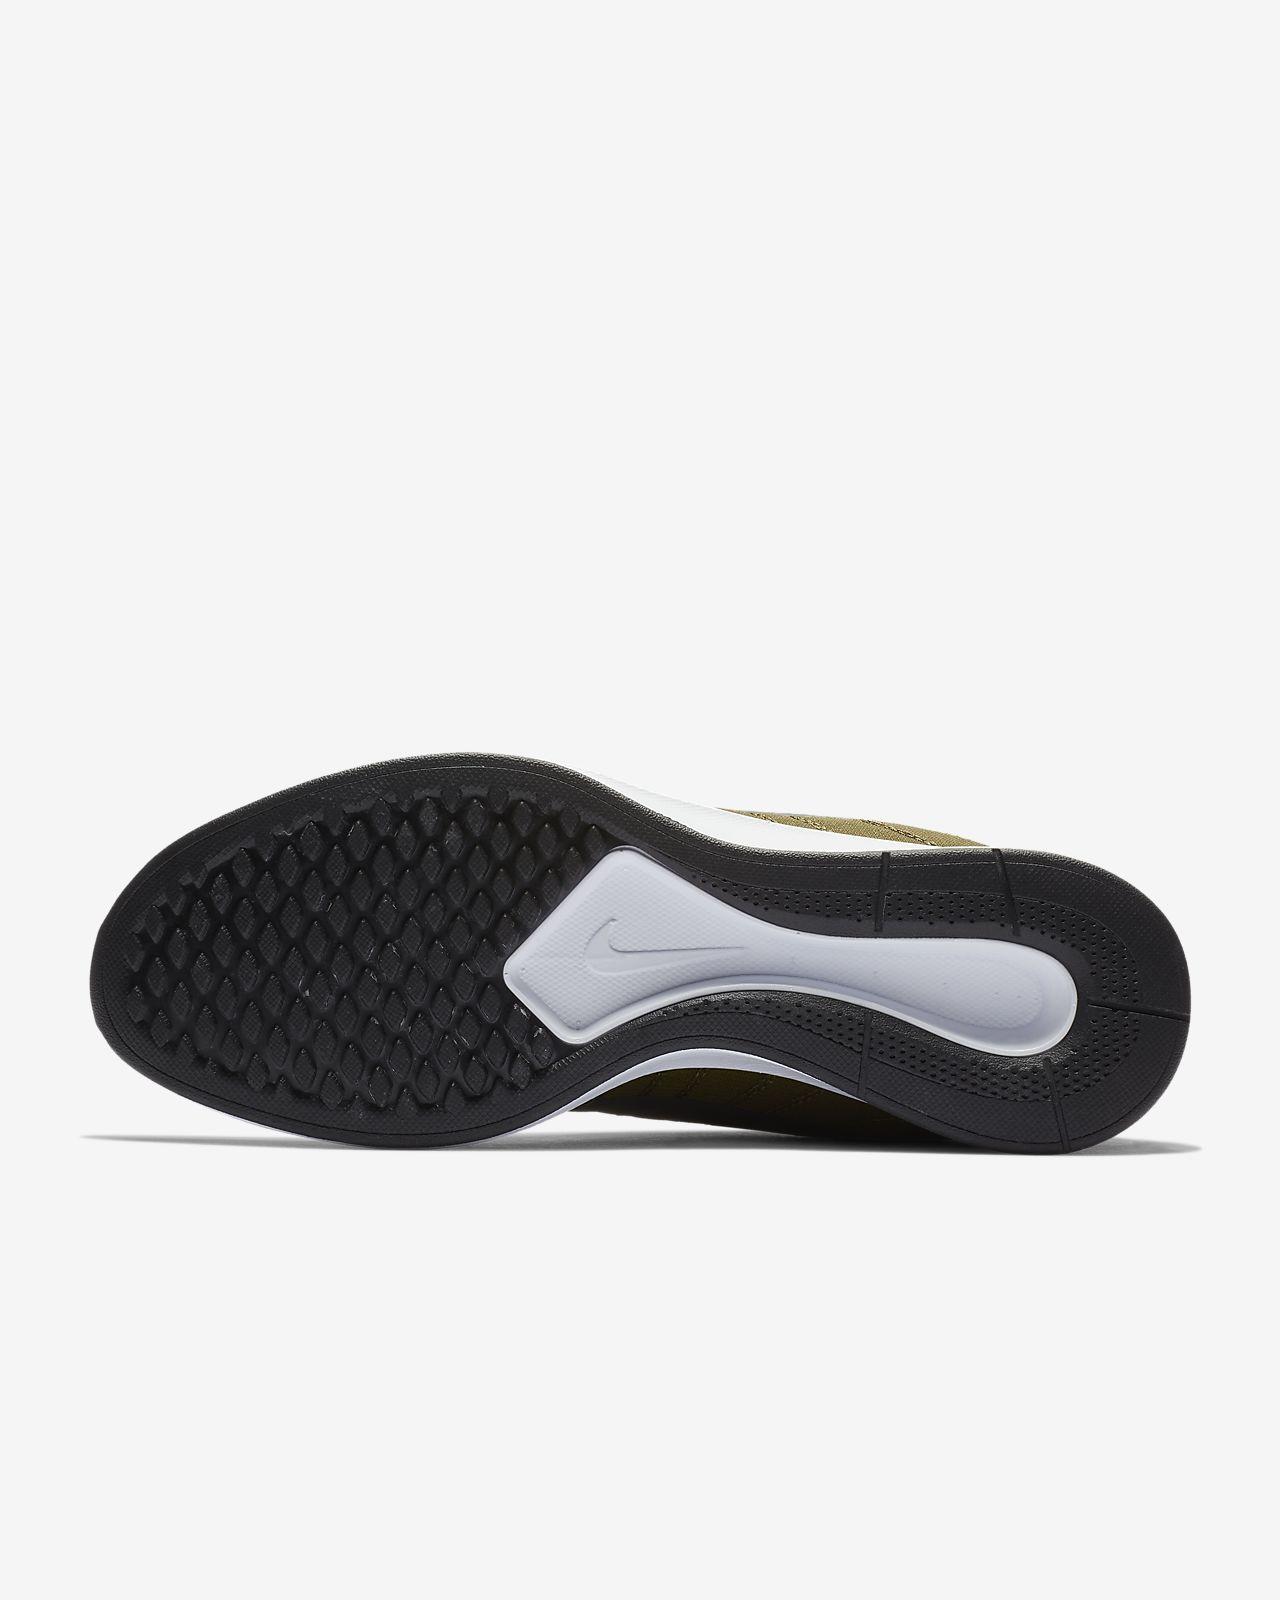 best sneakers 66652 a9c08 Chaussure pour Homme. Nike DualTone Racer